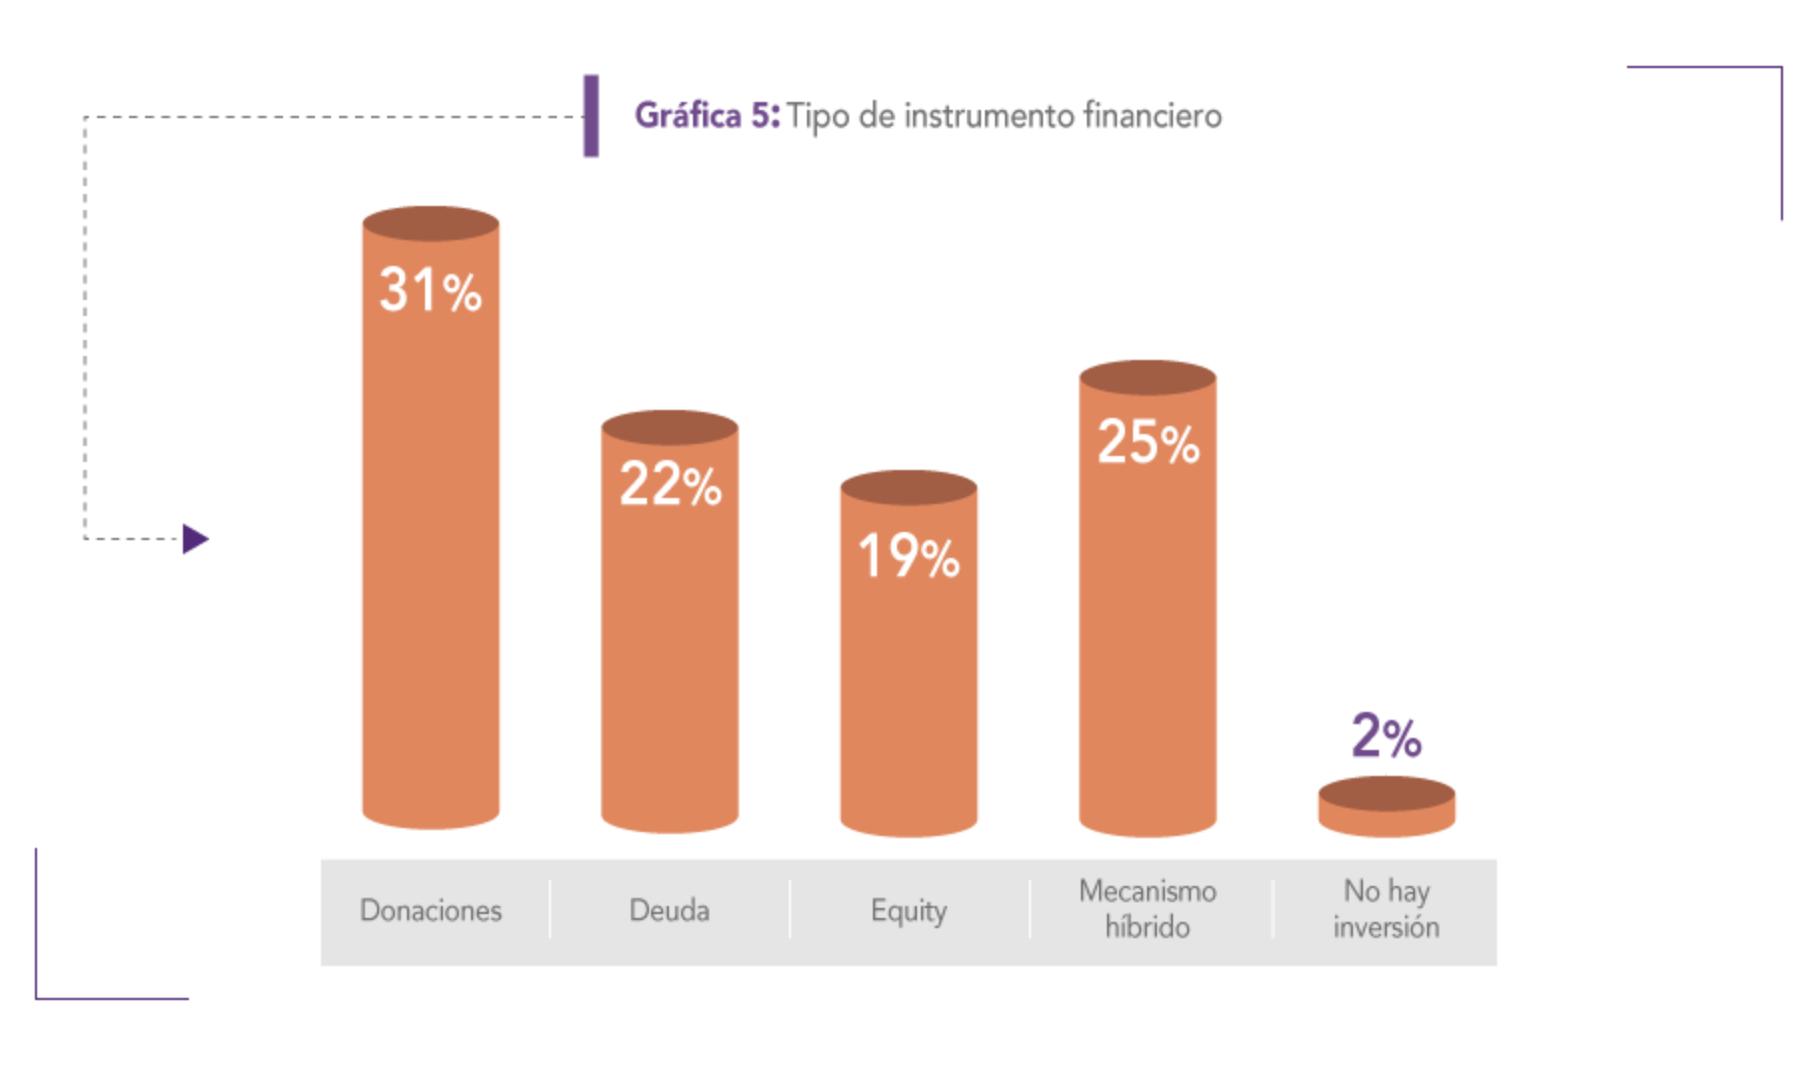 Latimpacto finance instruments